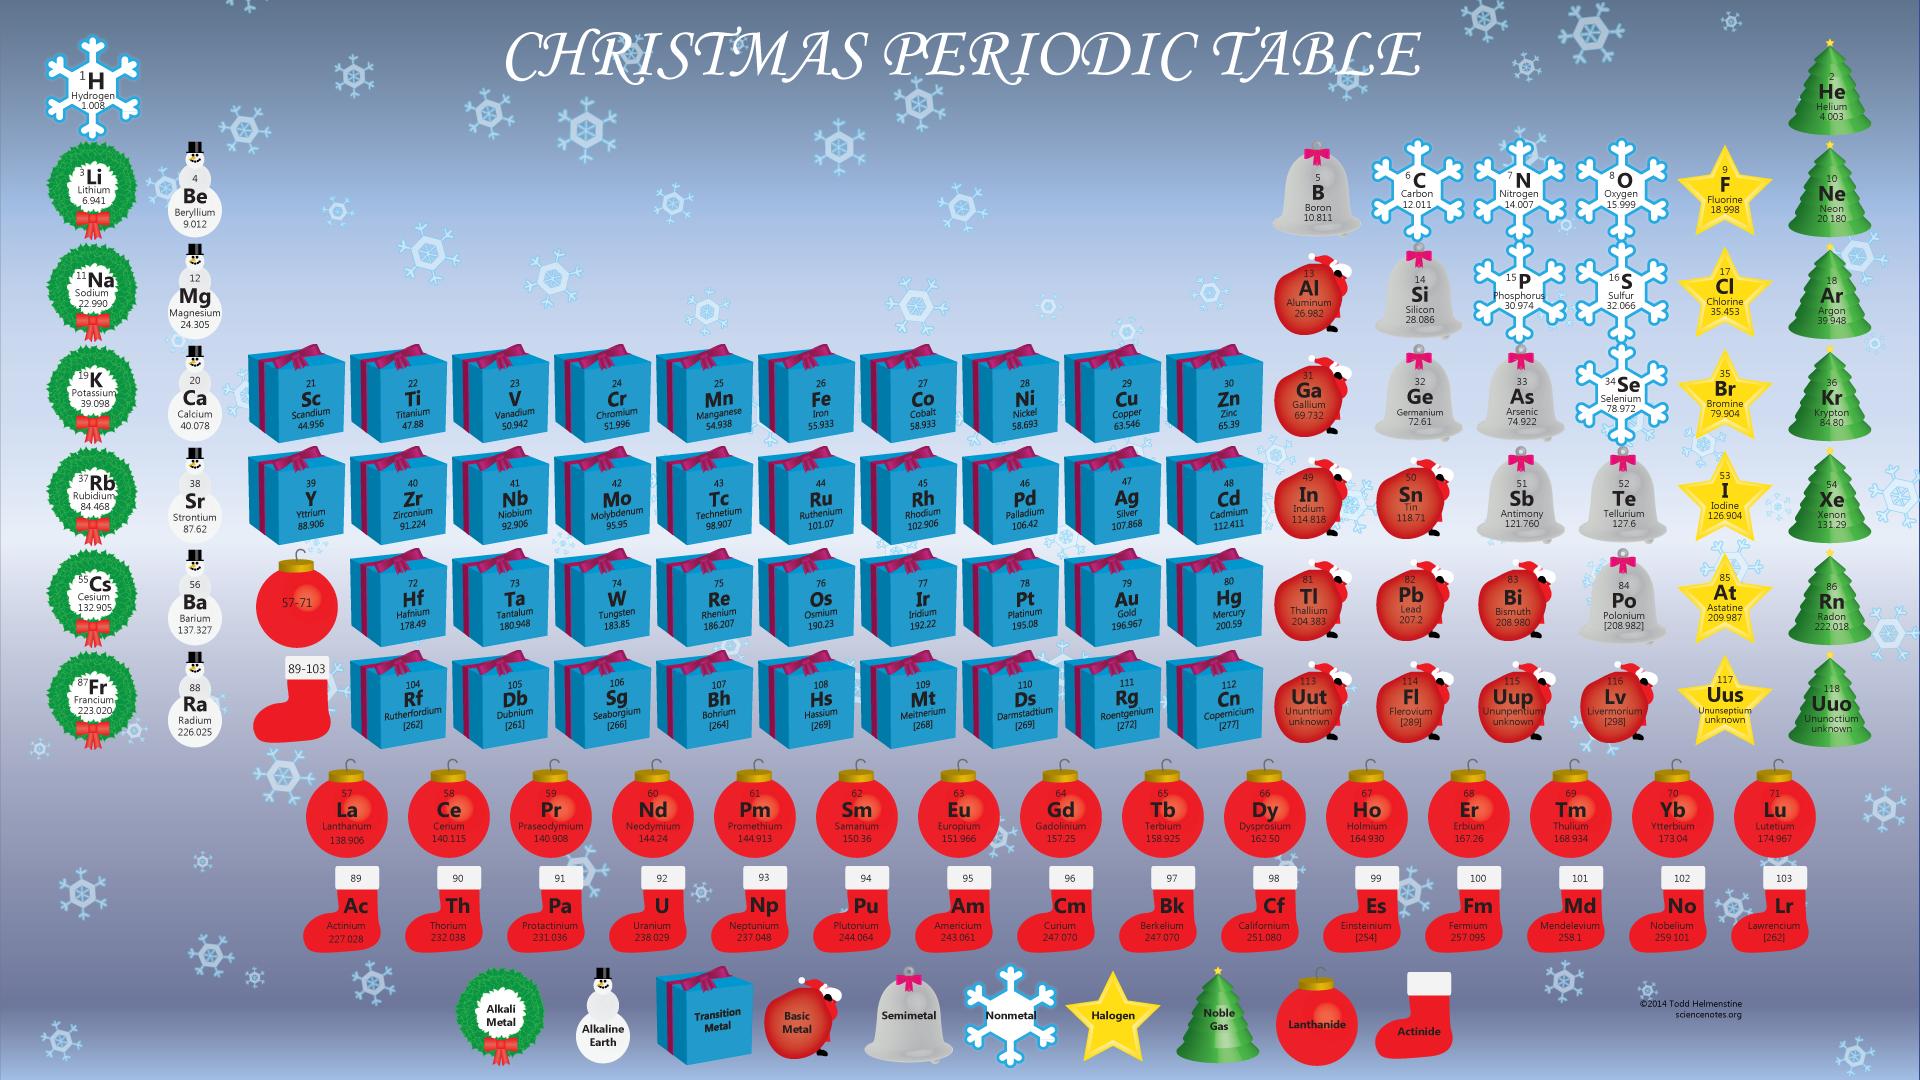 Biochemistry wallpaper wallpapersafari holiday desktop with this christmas themed periodic table wallpaper 1920x1080 urtaz Choice Image